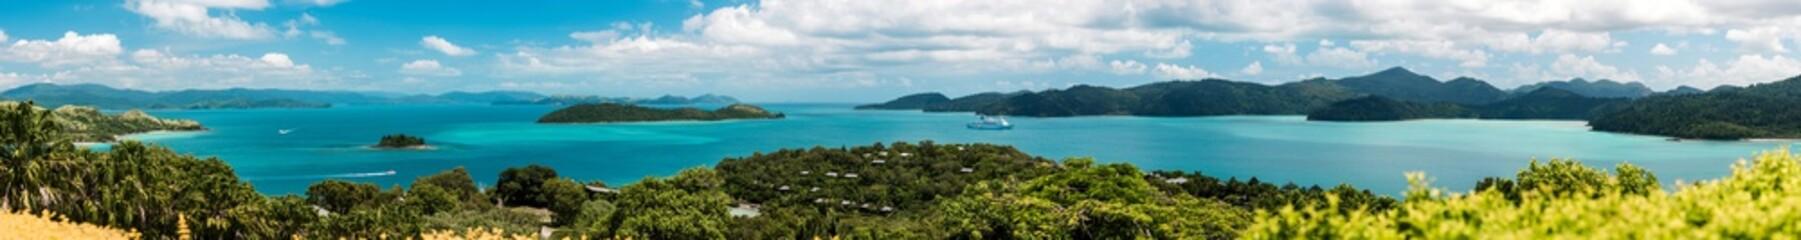 Fototapeta panoramic view of Hamilton Island Resort Queensland Australia obraz